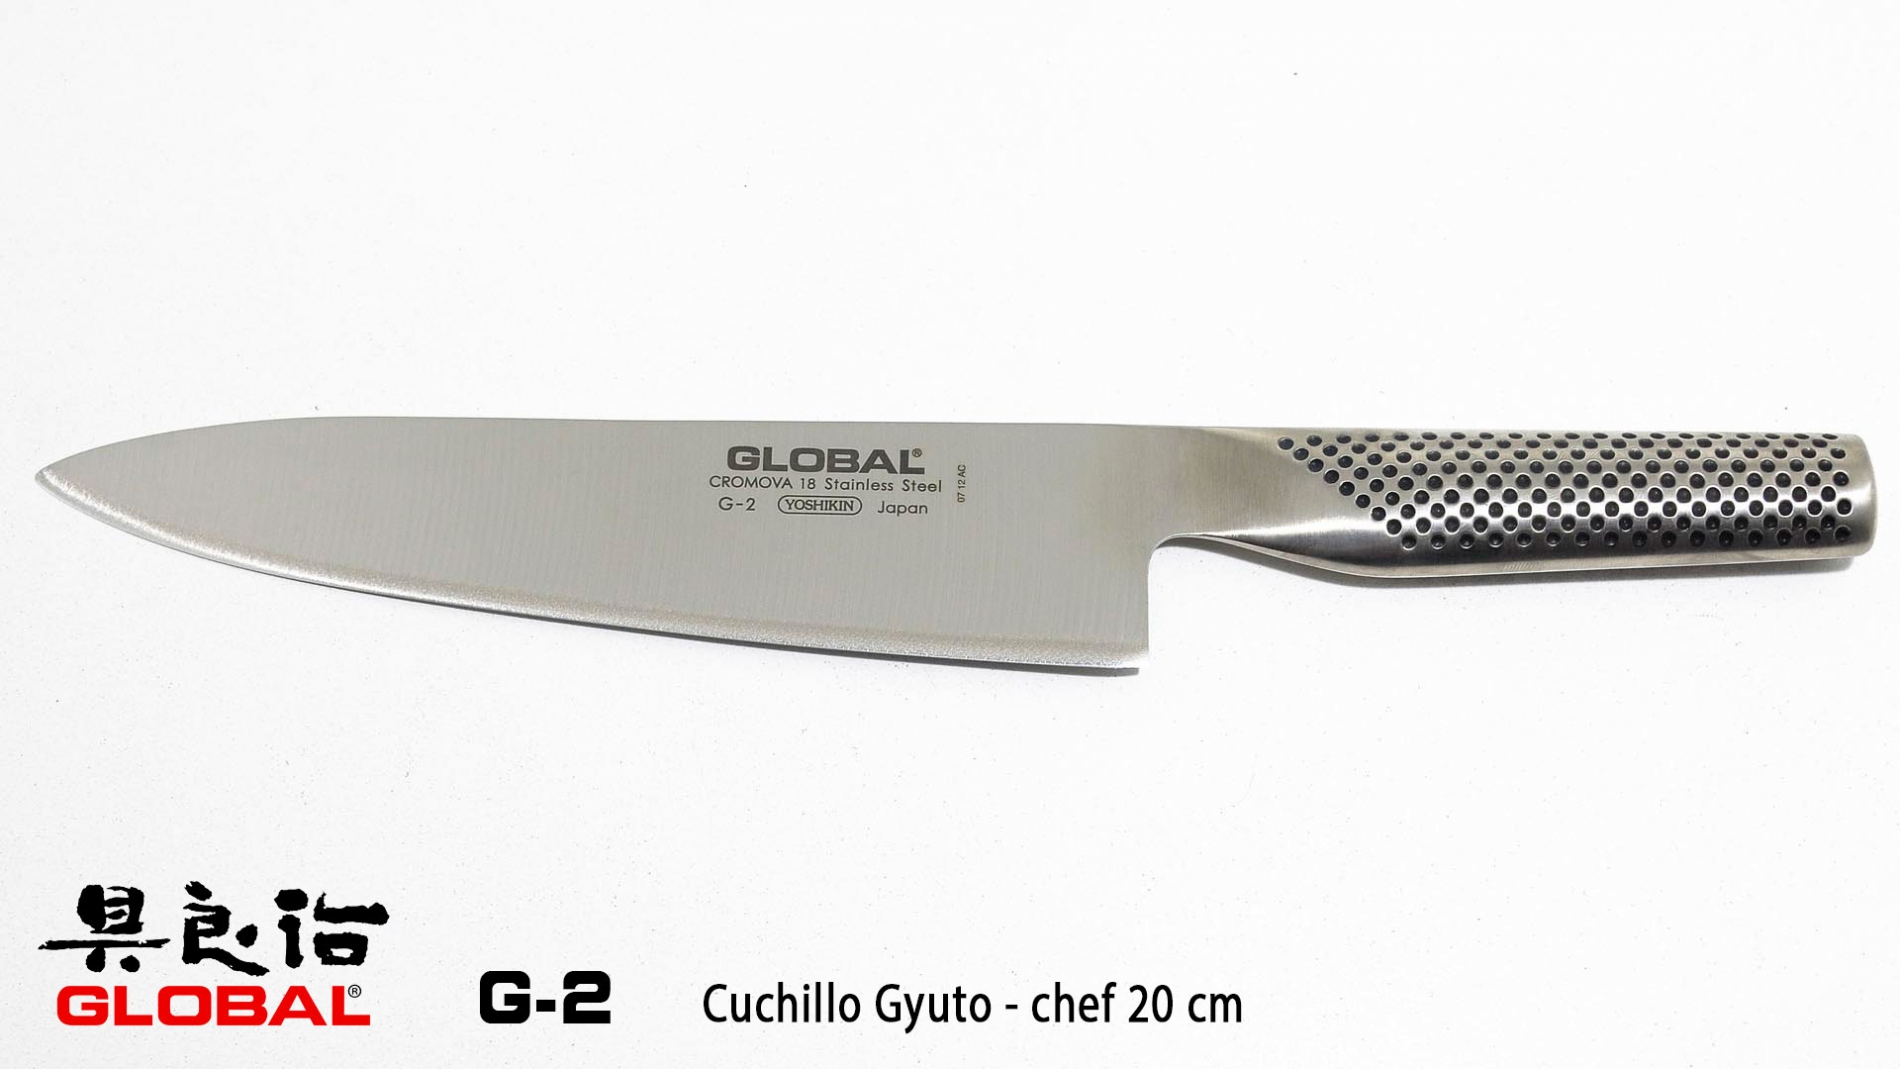 G-2-Cuchillo Gyuto 20cm de chef  Global G-2-max-6.